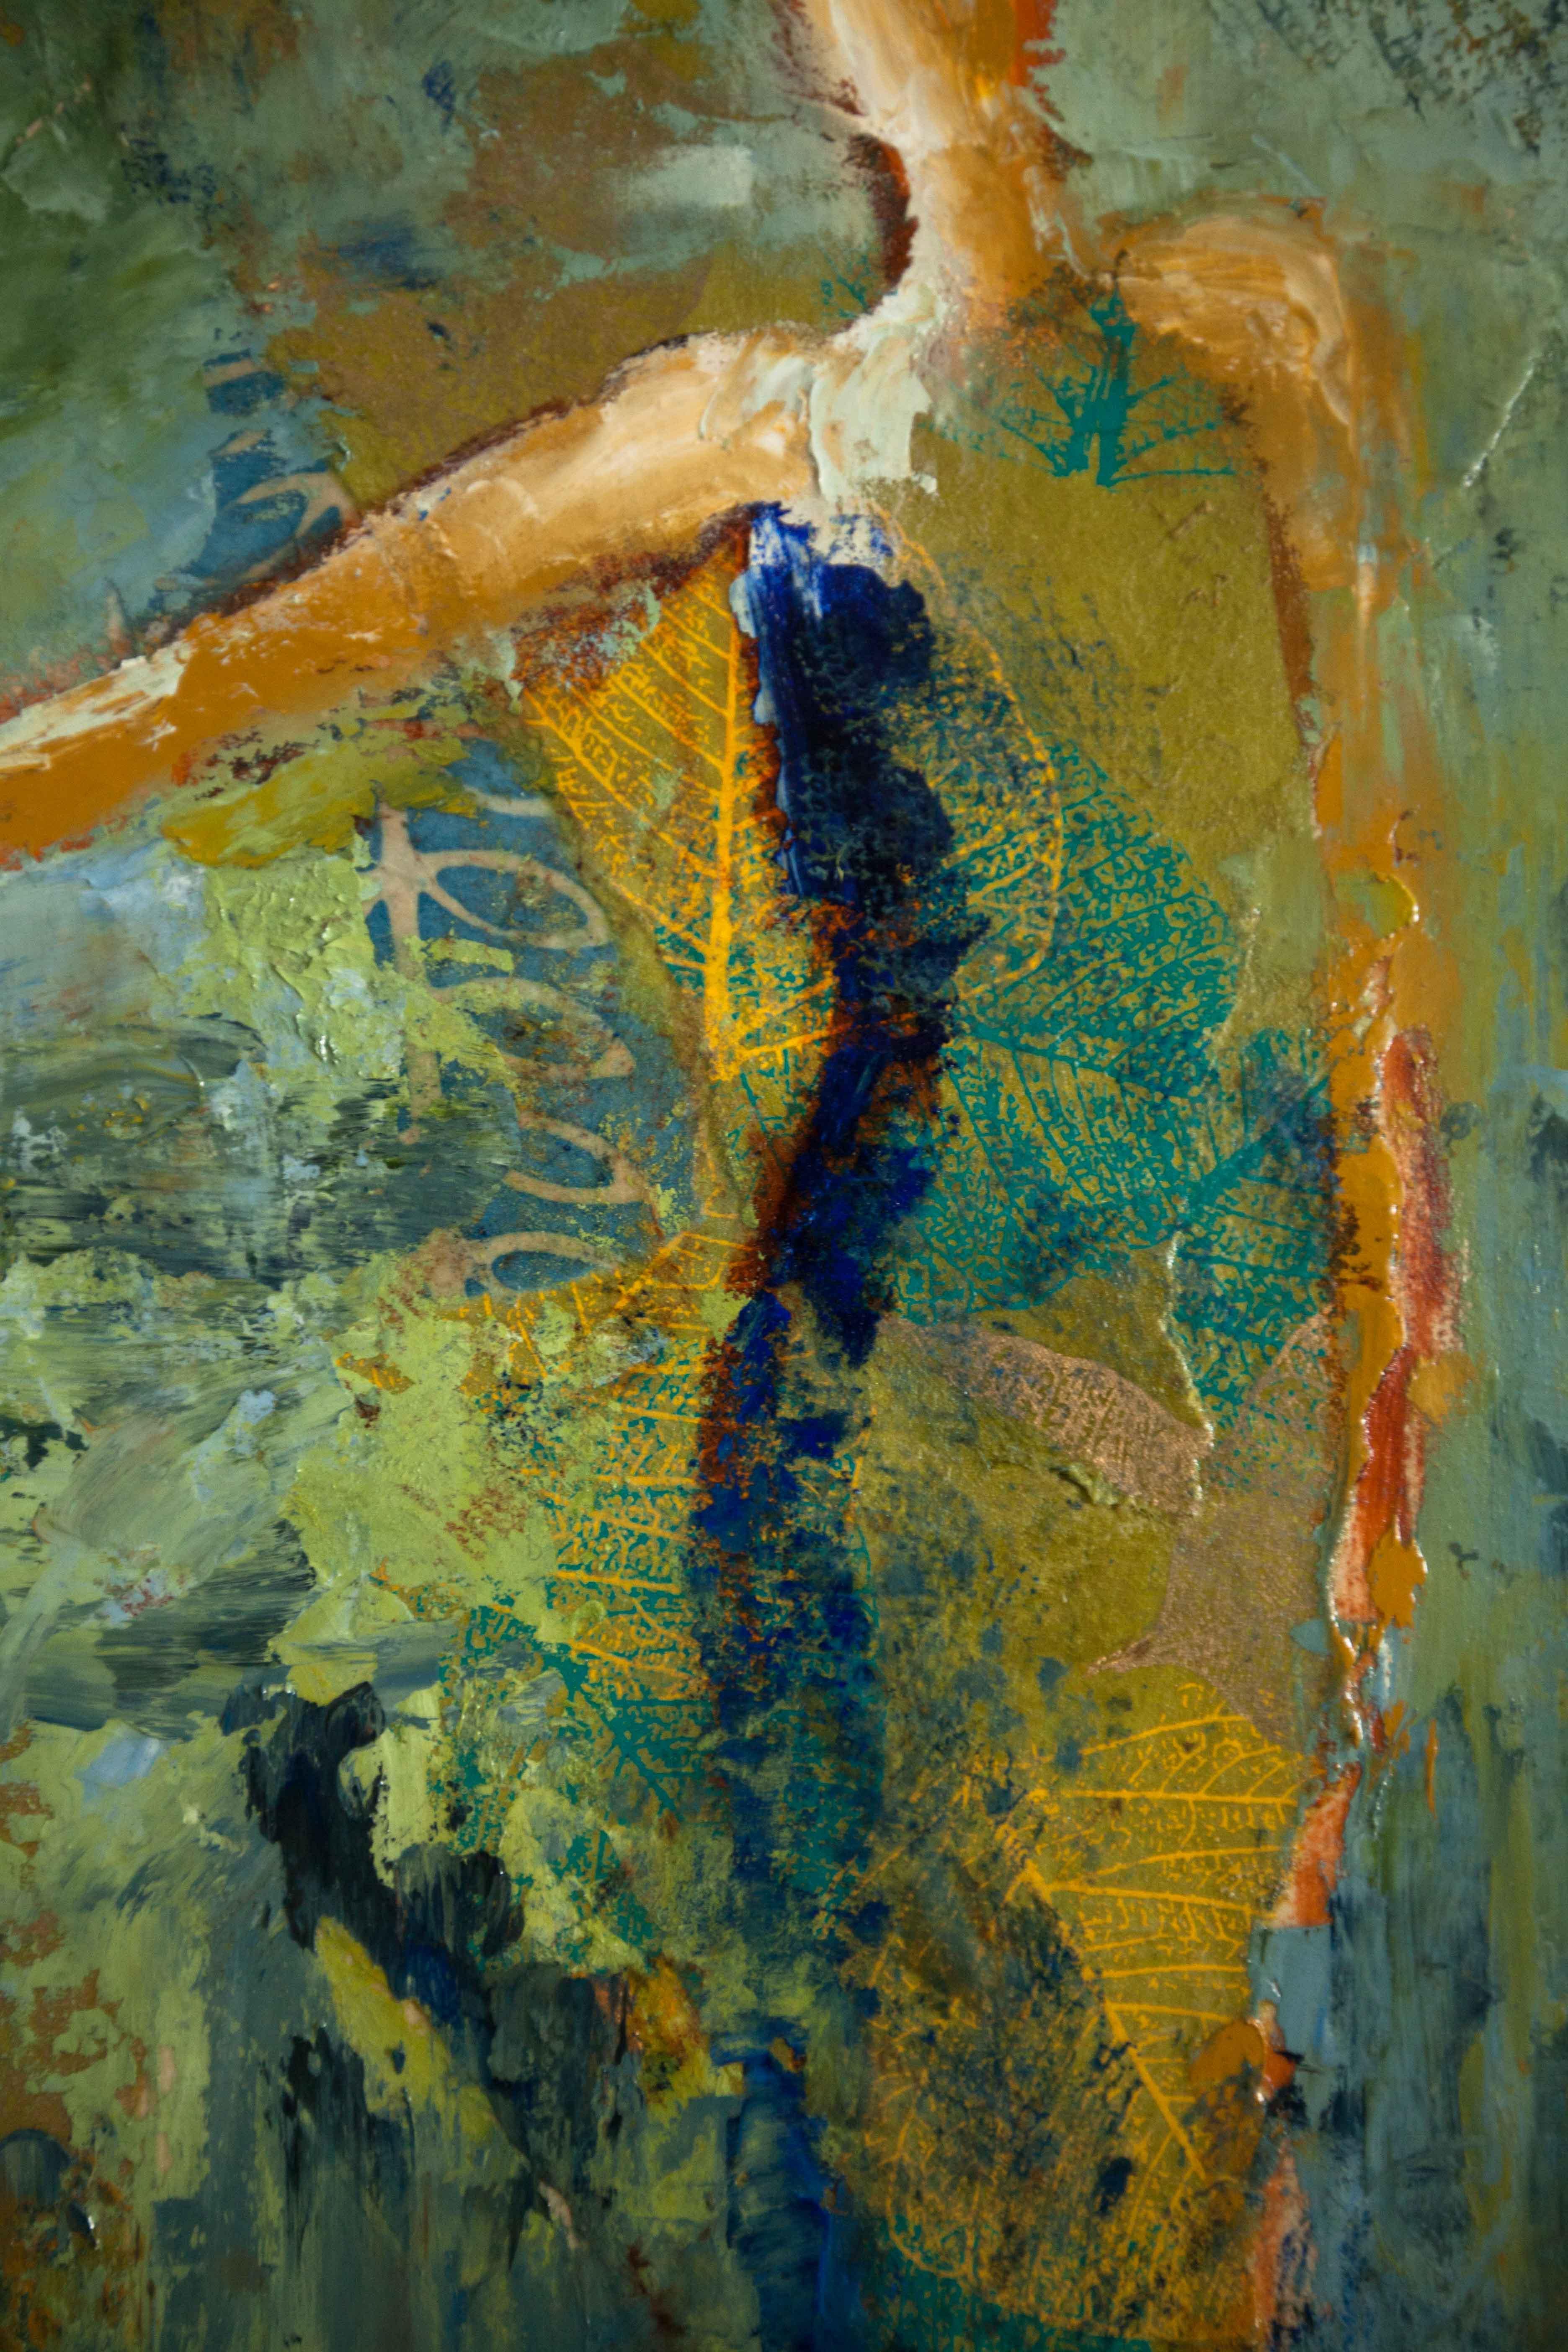 Abstract Figurative Mixed Media Art